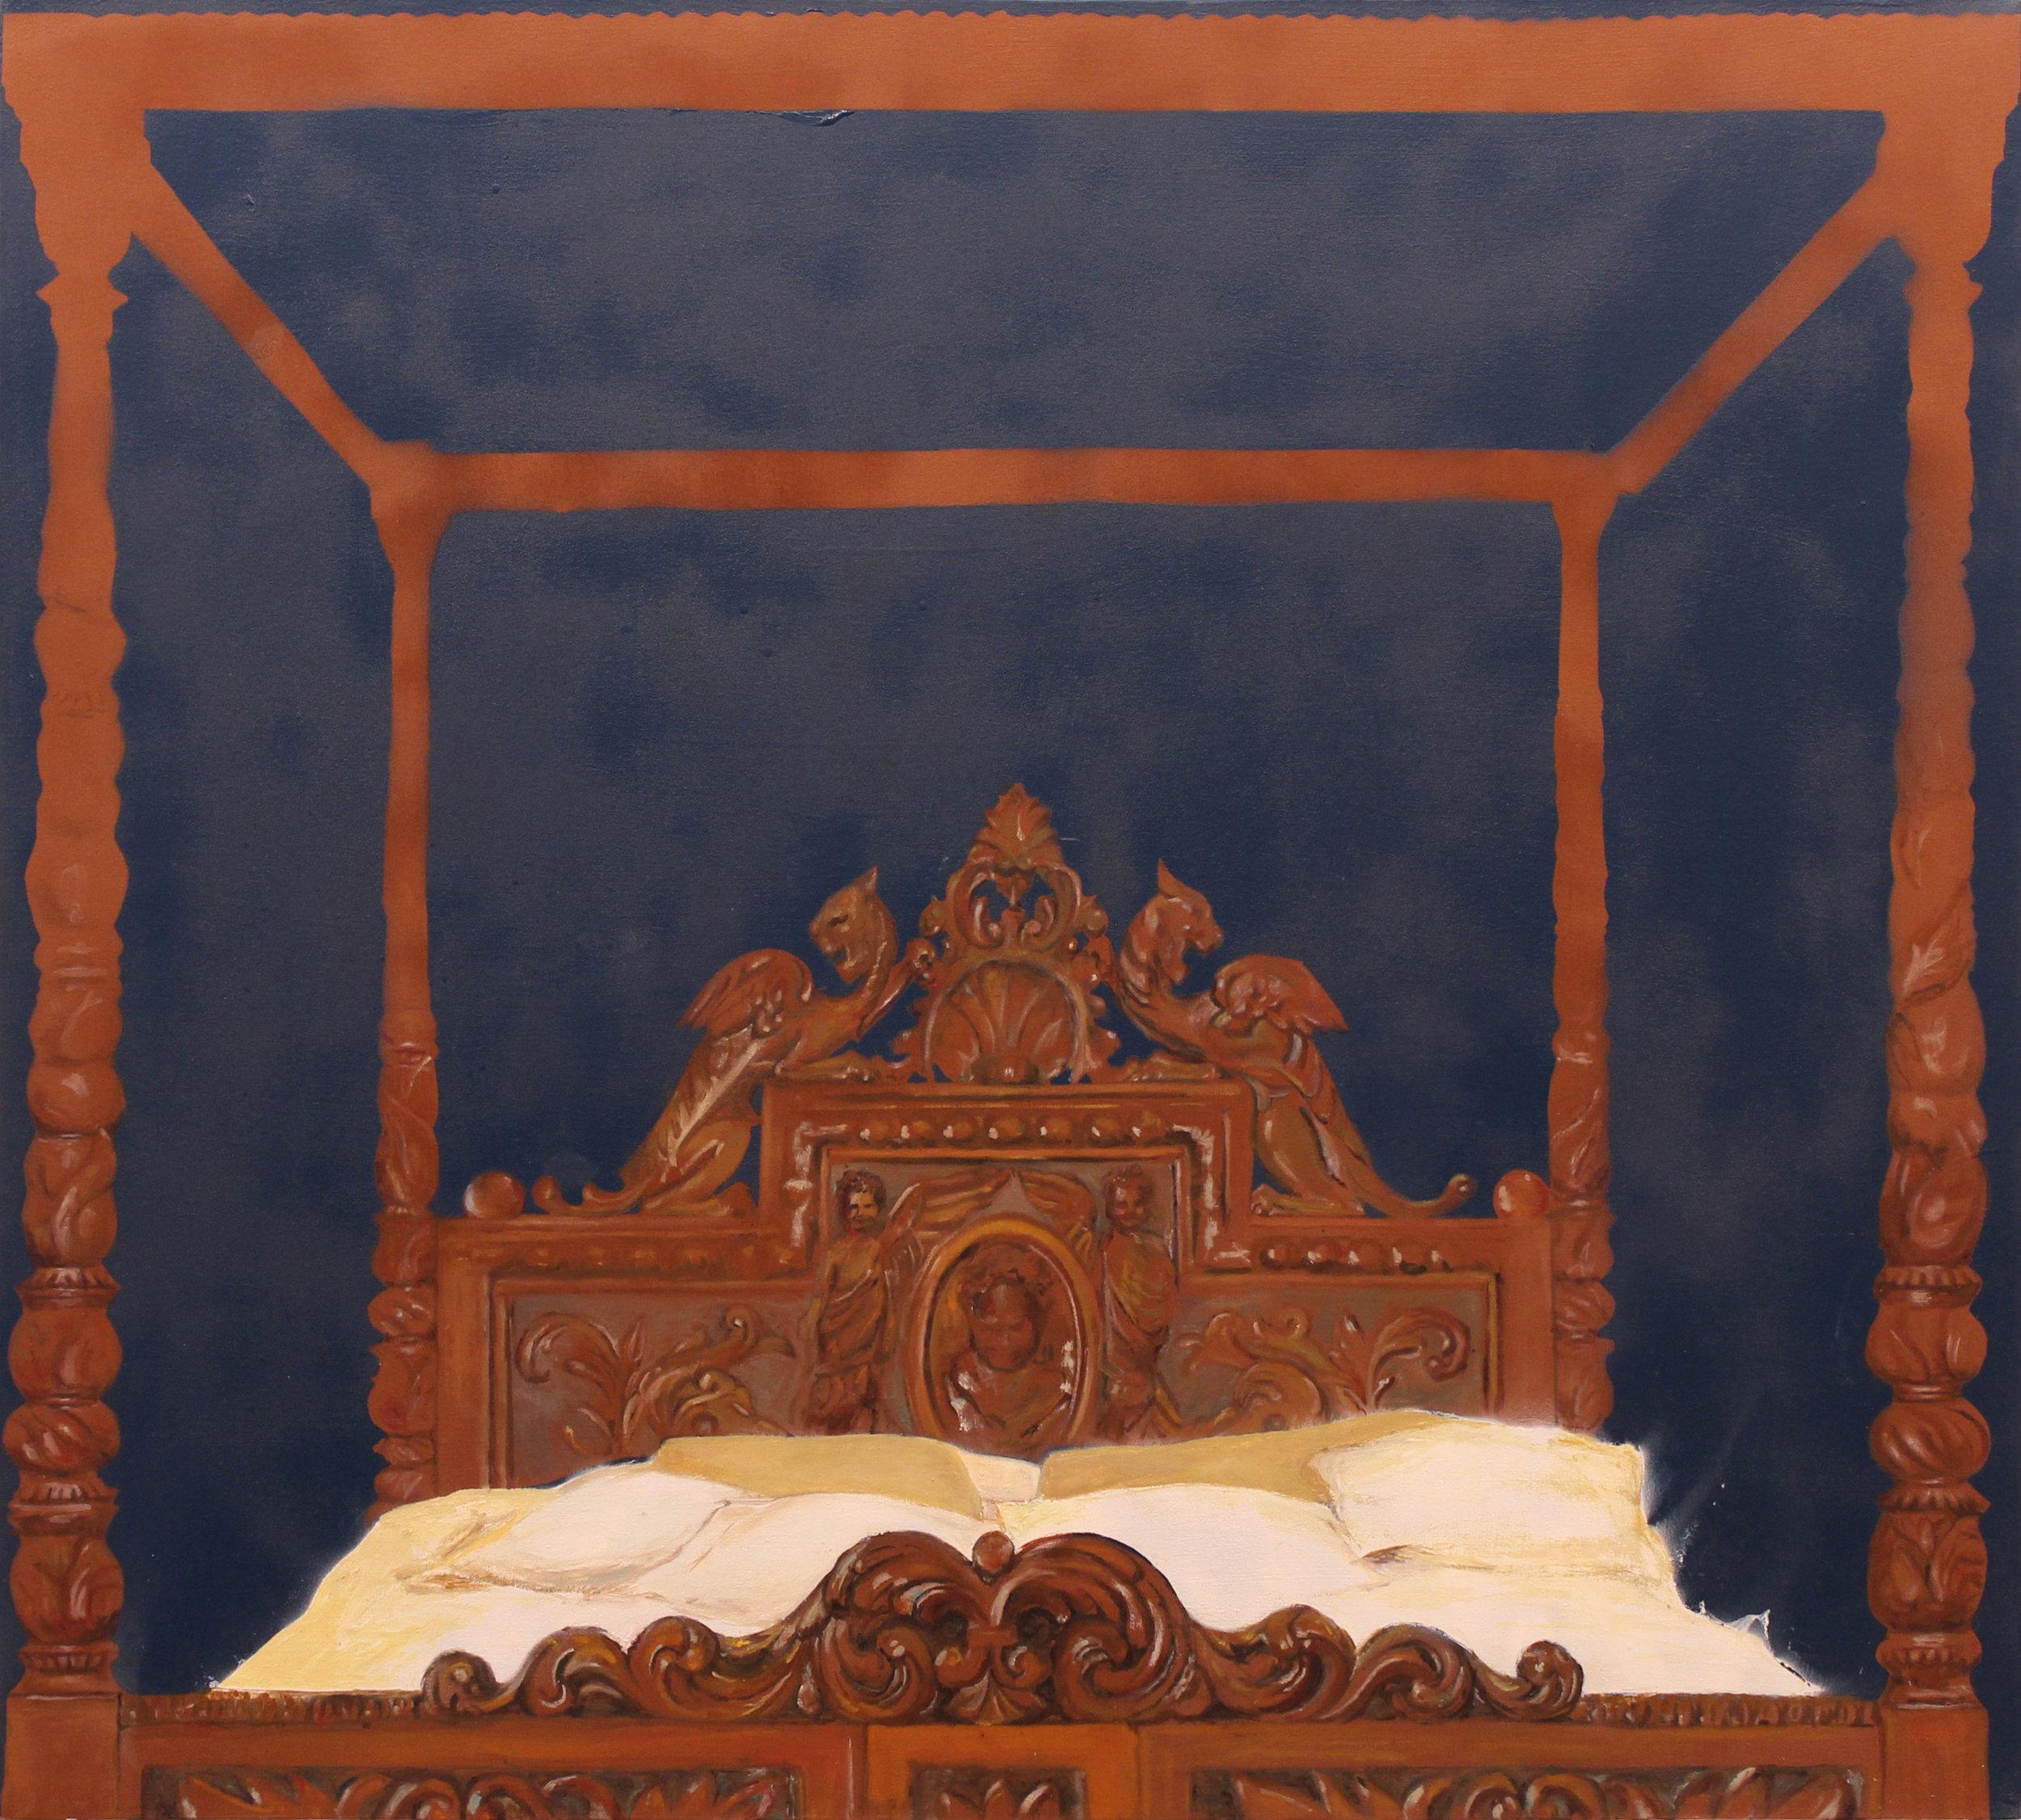 """Heirloom I,"" Oil and Spray Paint on Canvas, 2015, 48"" x 43.5"""